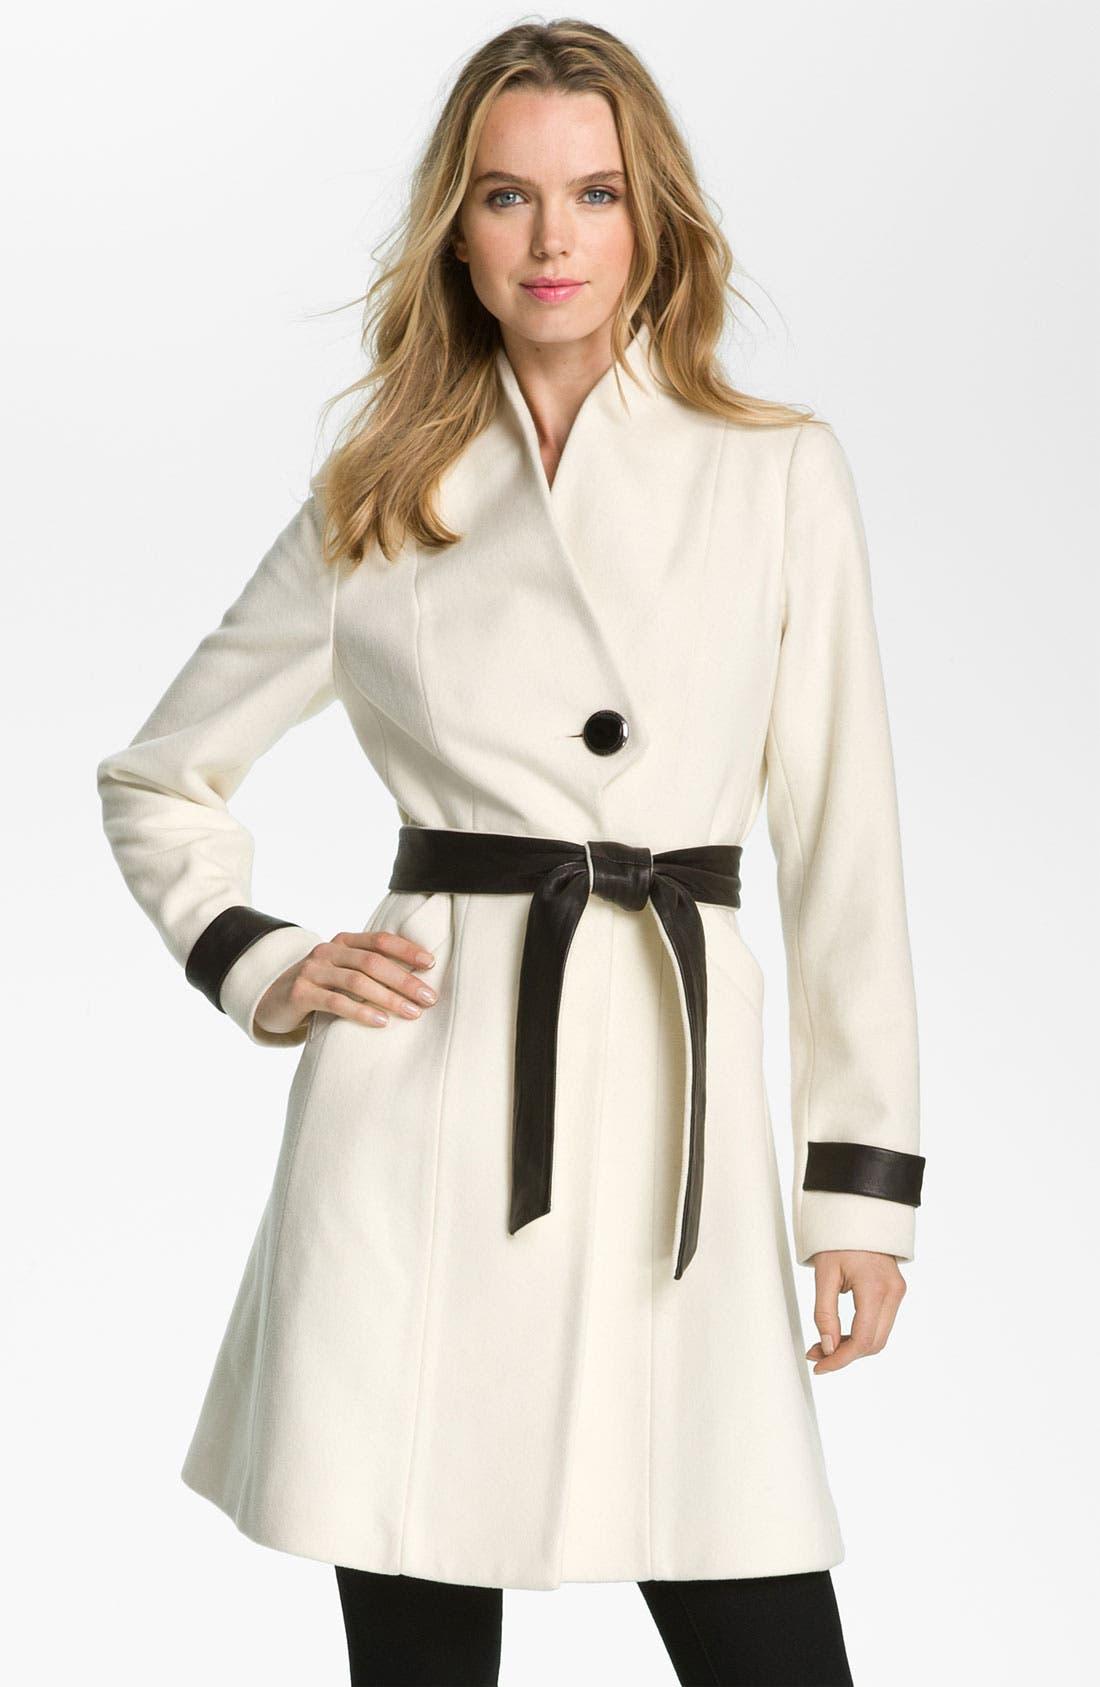 Alternate Image 1 Selected - Badgley Mischka 'Sasha' Coat